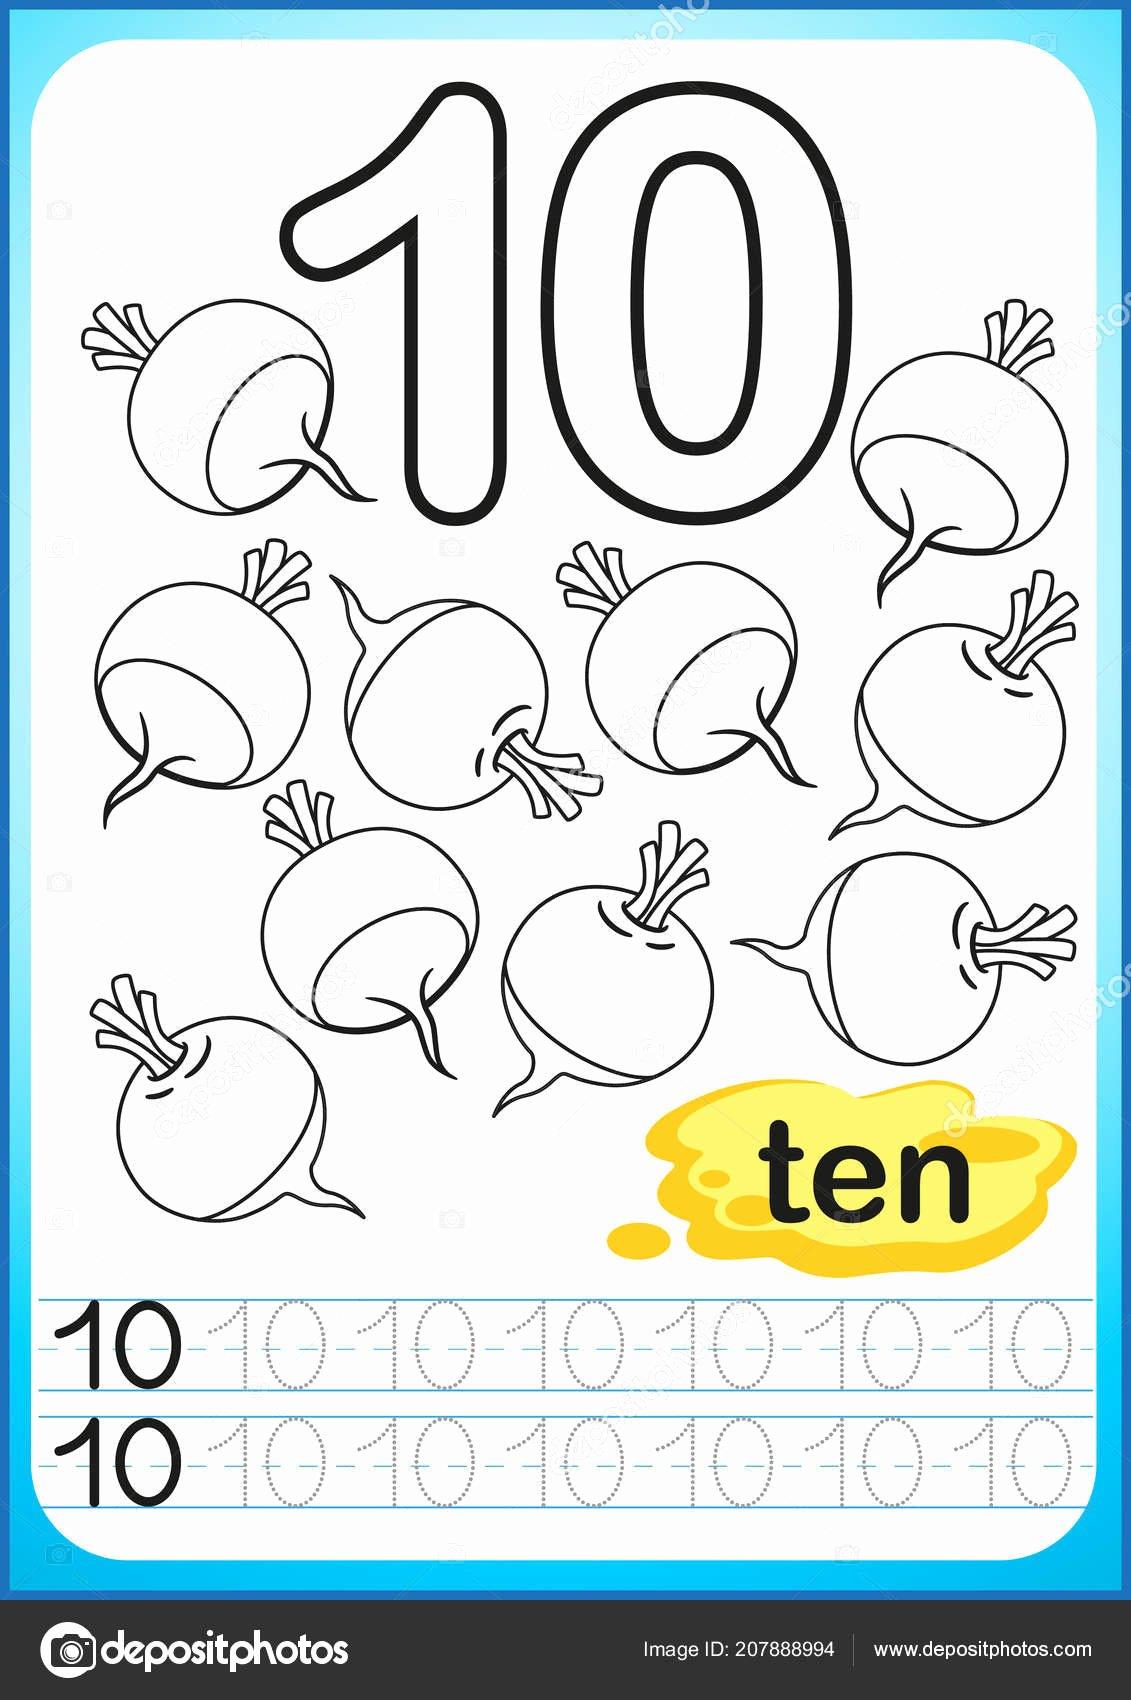 Sharing Worksheets for Preschoolers New Worksheet Level Reading Writing Skills for Preschoolers